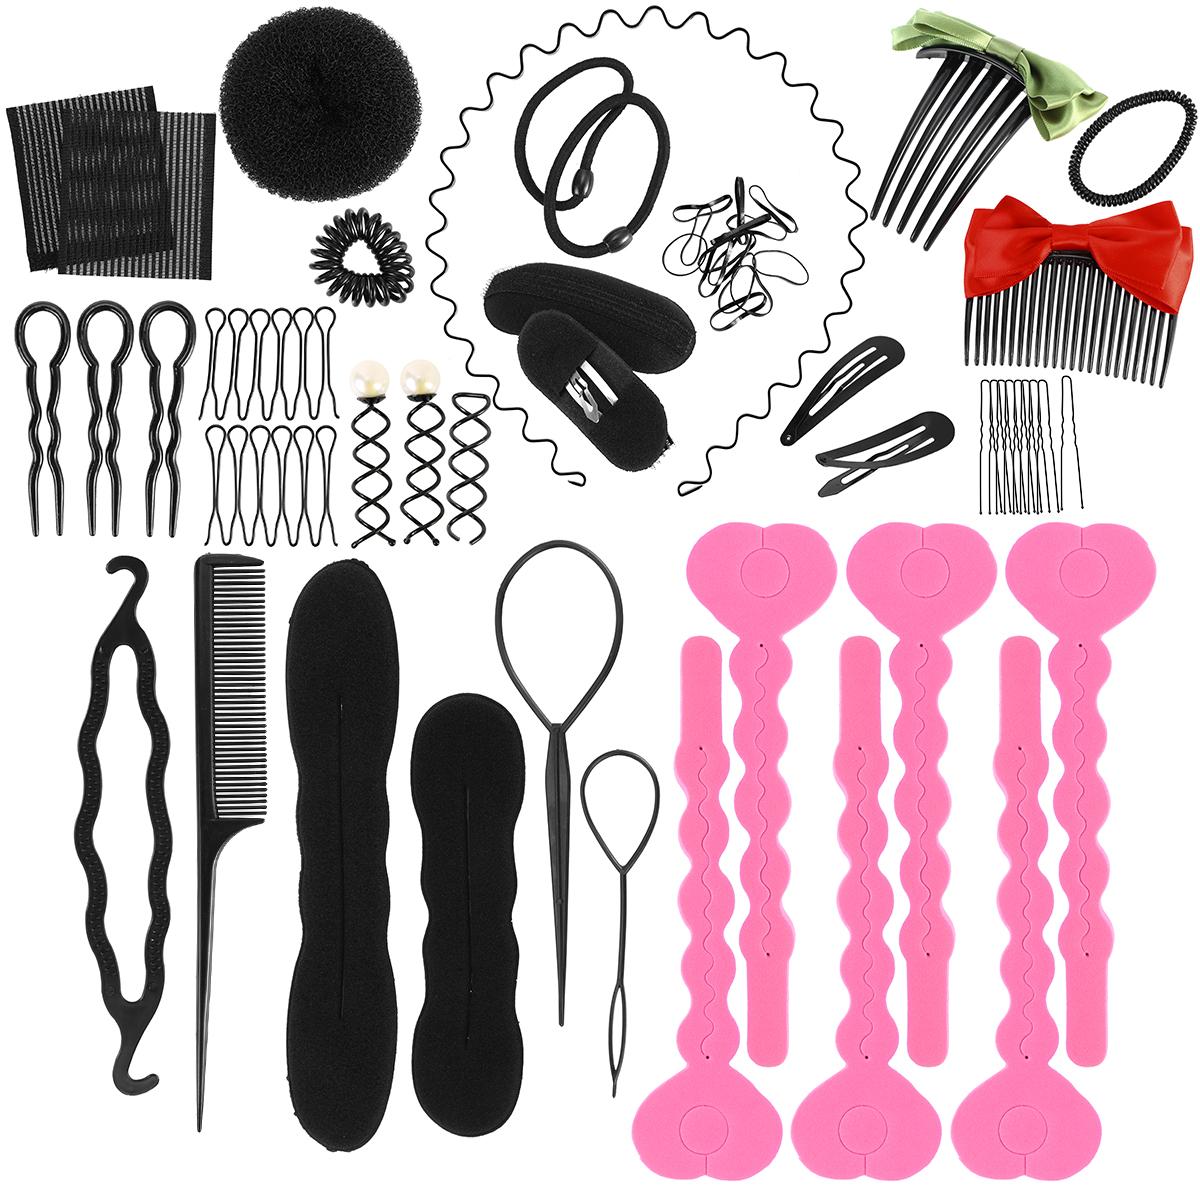 Hair Design Styling Accessories Hair Braider Kit Donut Hairs Clip Accessory Tool Hairdresser Magic Hair Clip